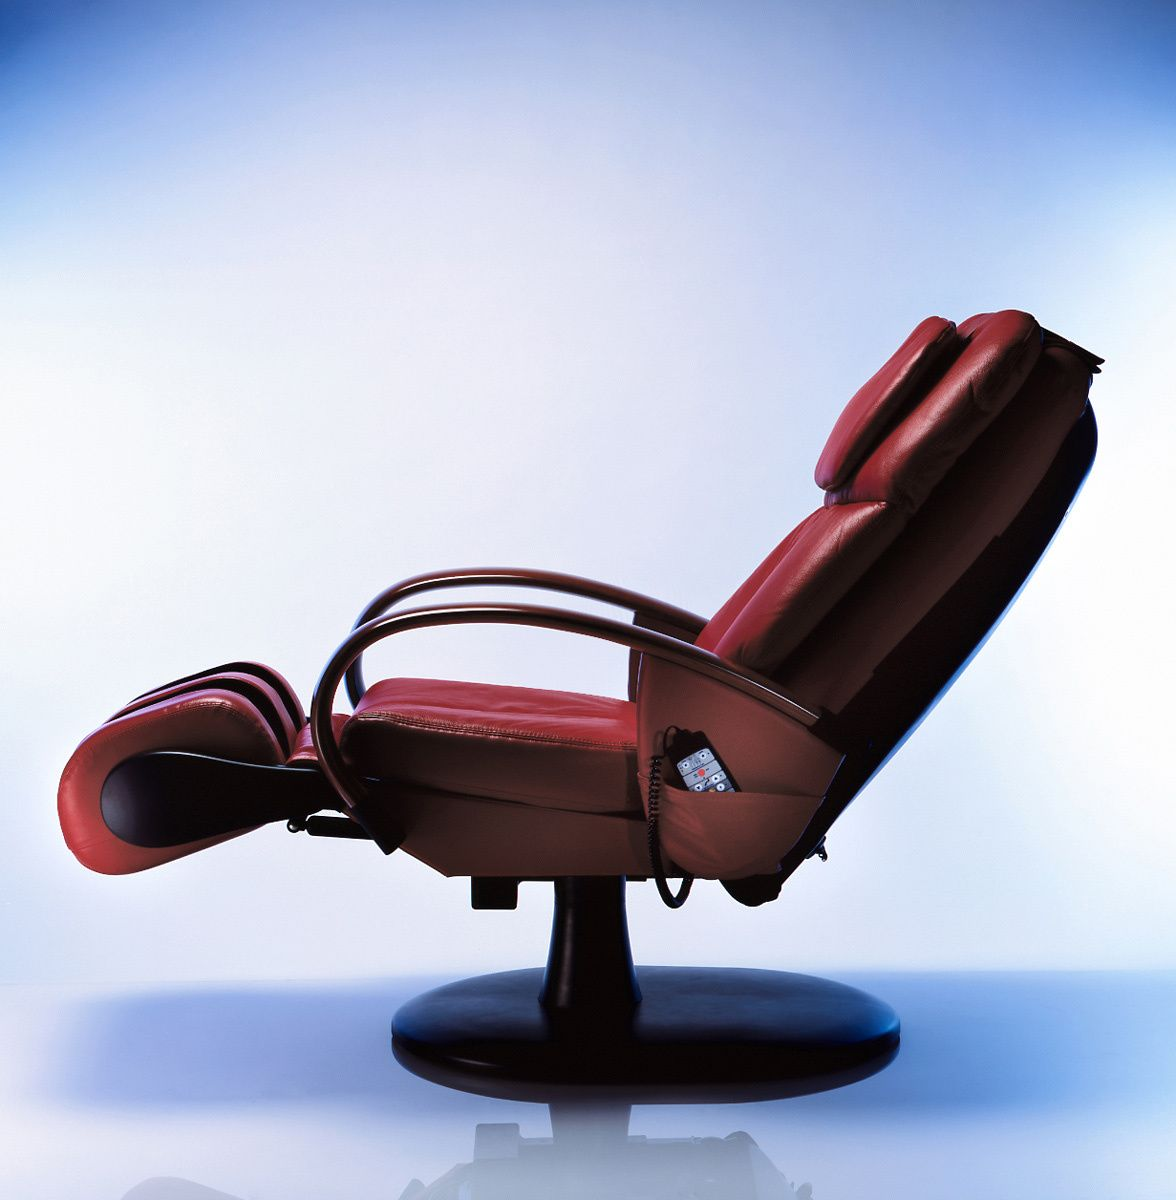 1massage_chair_f_2_edit